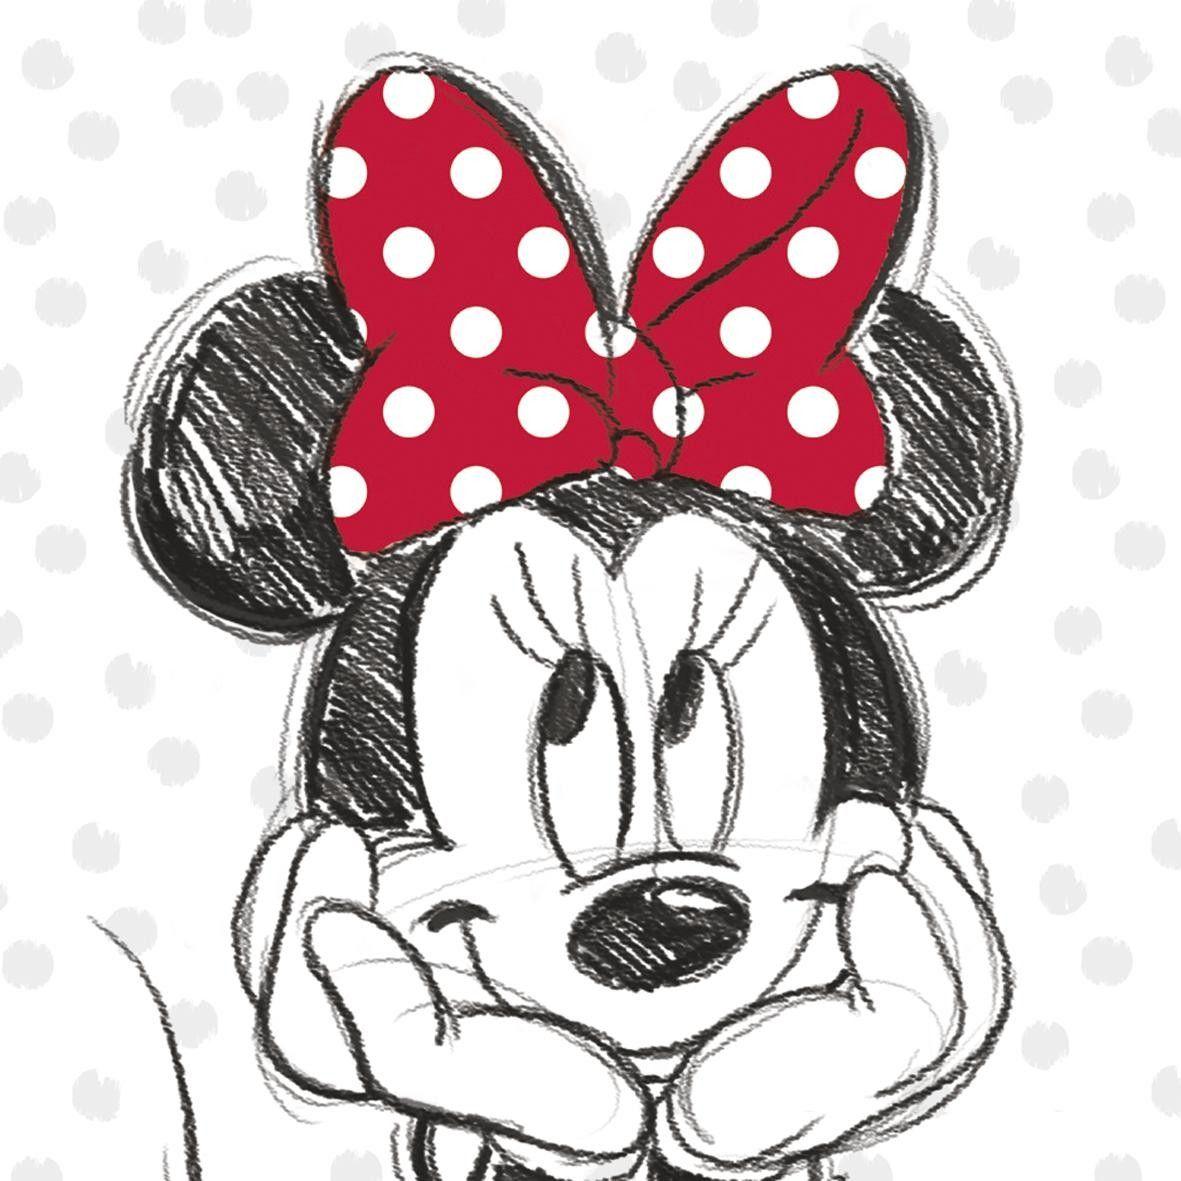 Photo of Keilrahmenbild Disney ca. 35x35cm Minnie Mouse ▶ online bei POCO kaufen